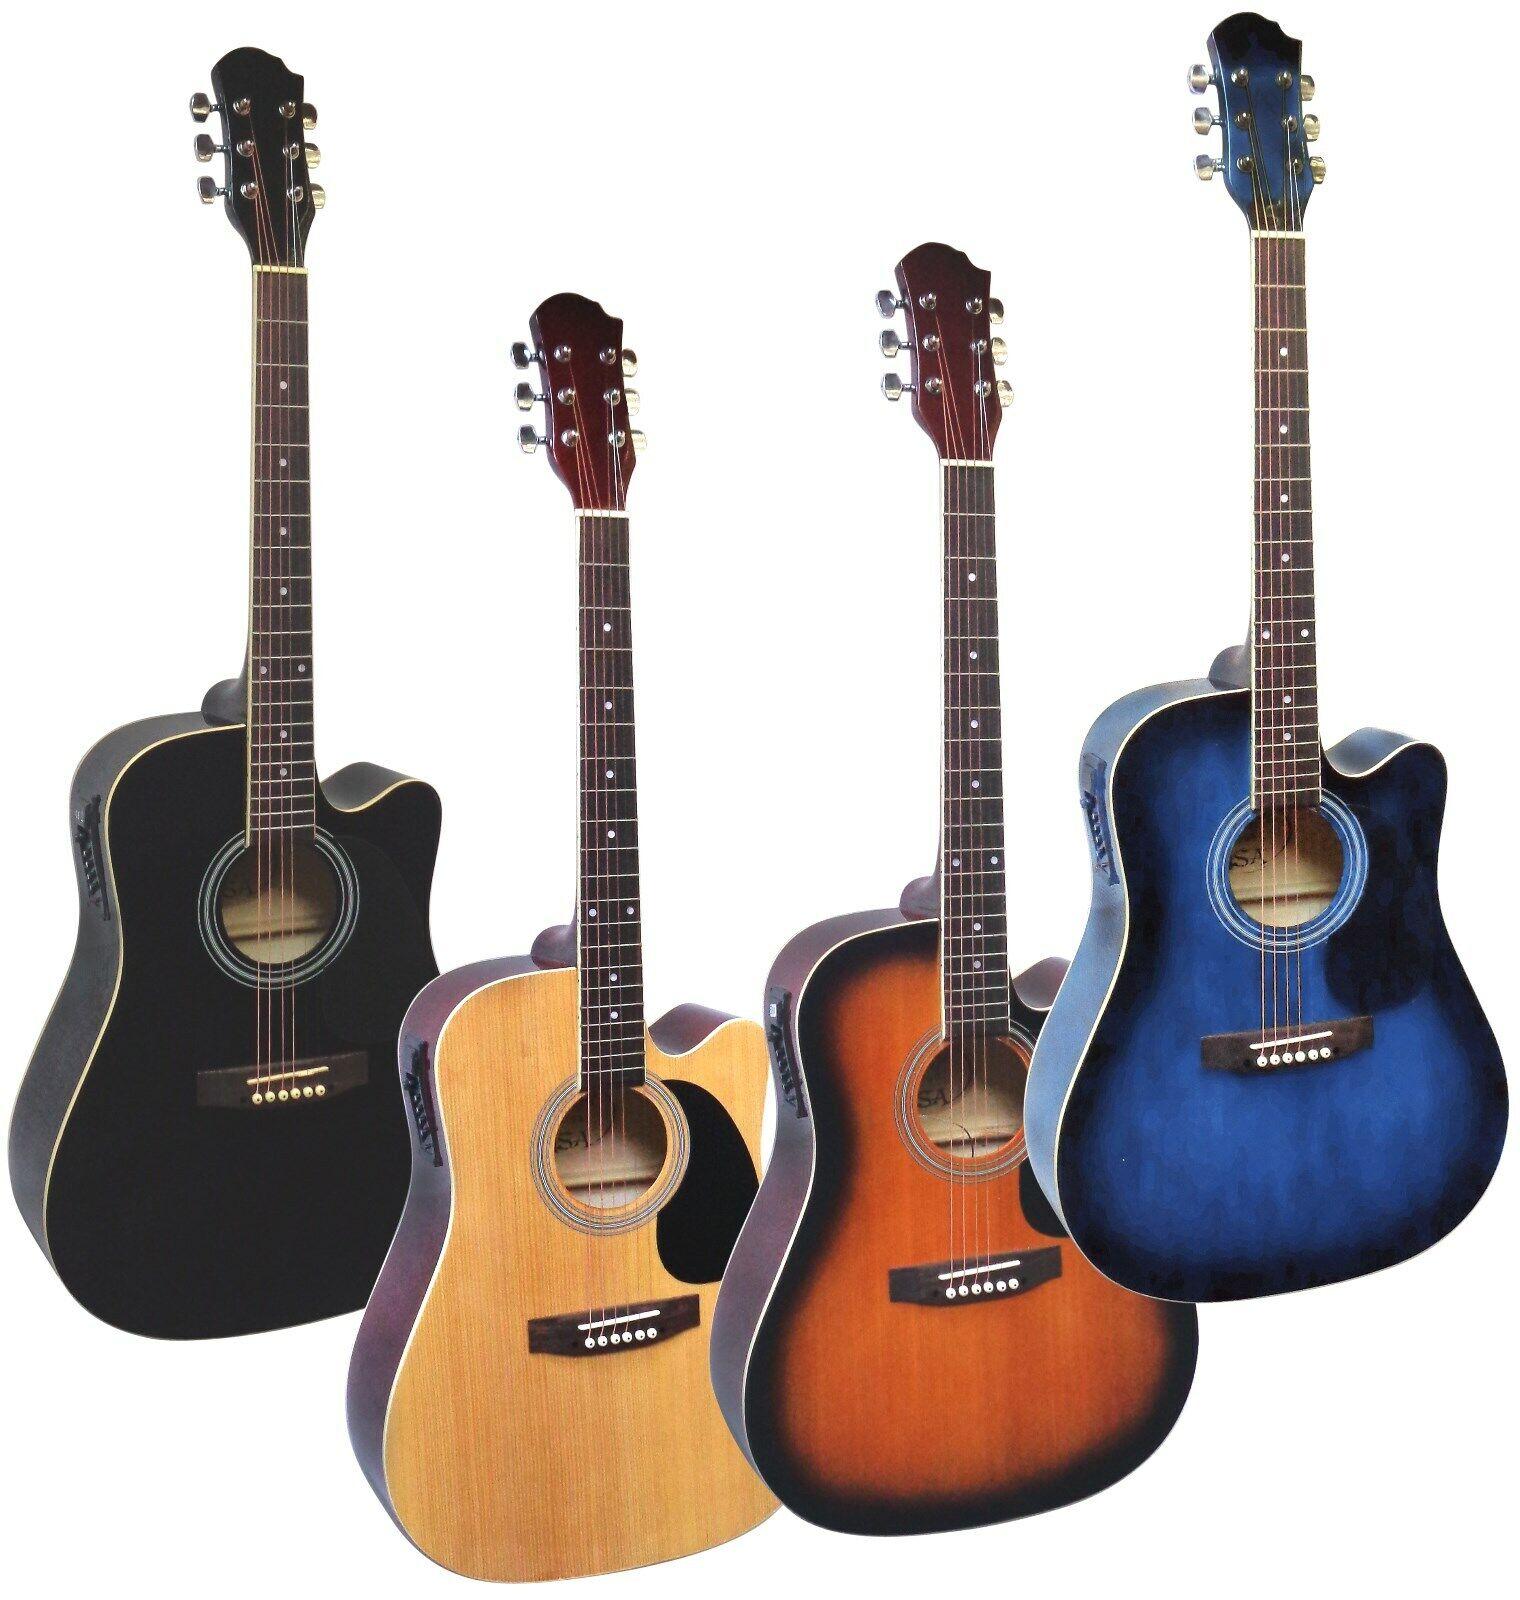 Gitarre Westerngitarre-Dreadnought 6Saiten-Tonabnehmer EQ-Anschlußkabel-Auswahl